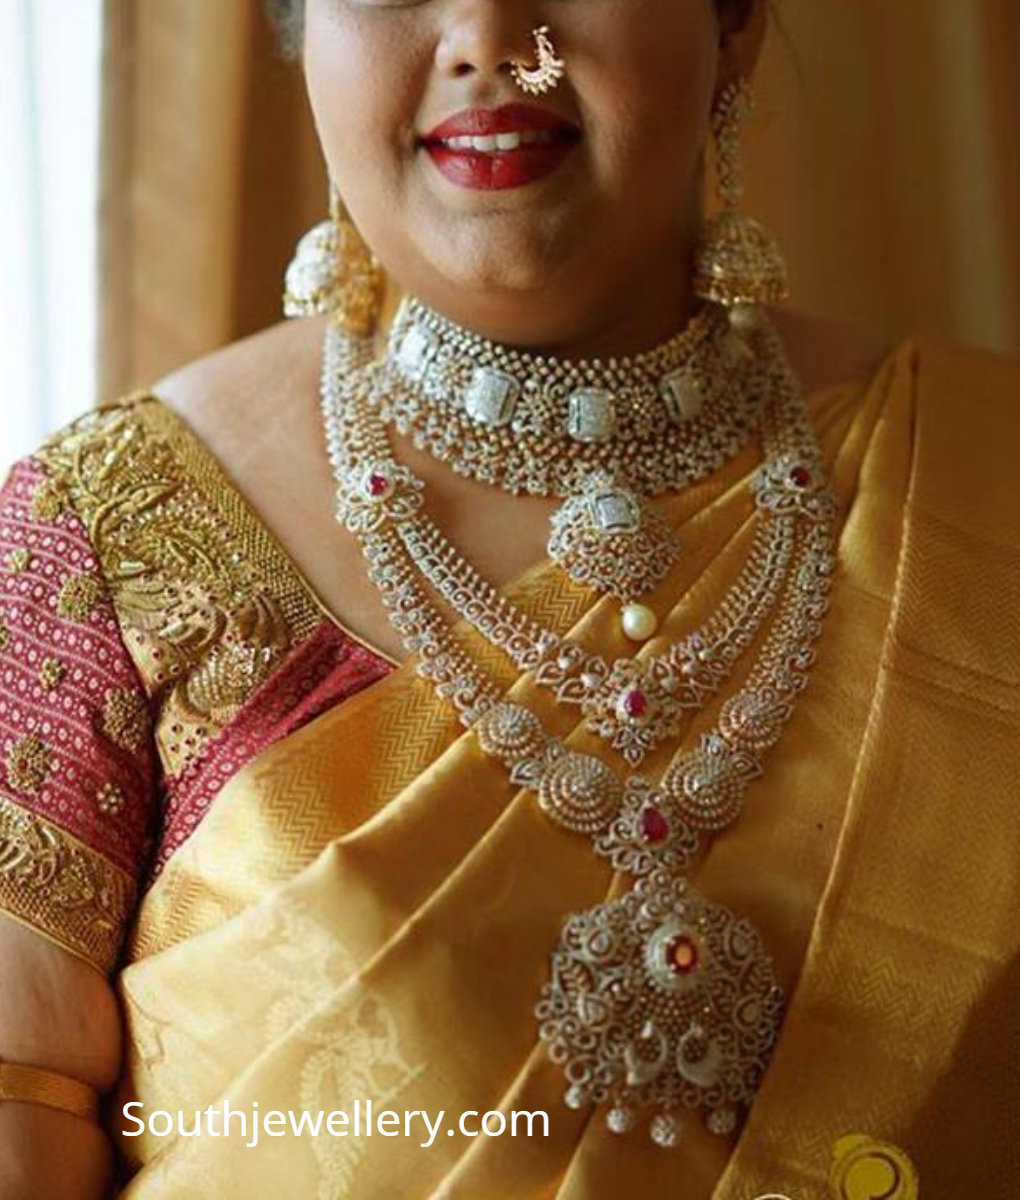 Bridal Diamond Jewellery Set By Sujana Jewellers Indian Jewellery Designs